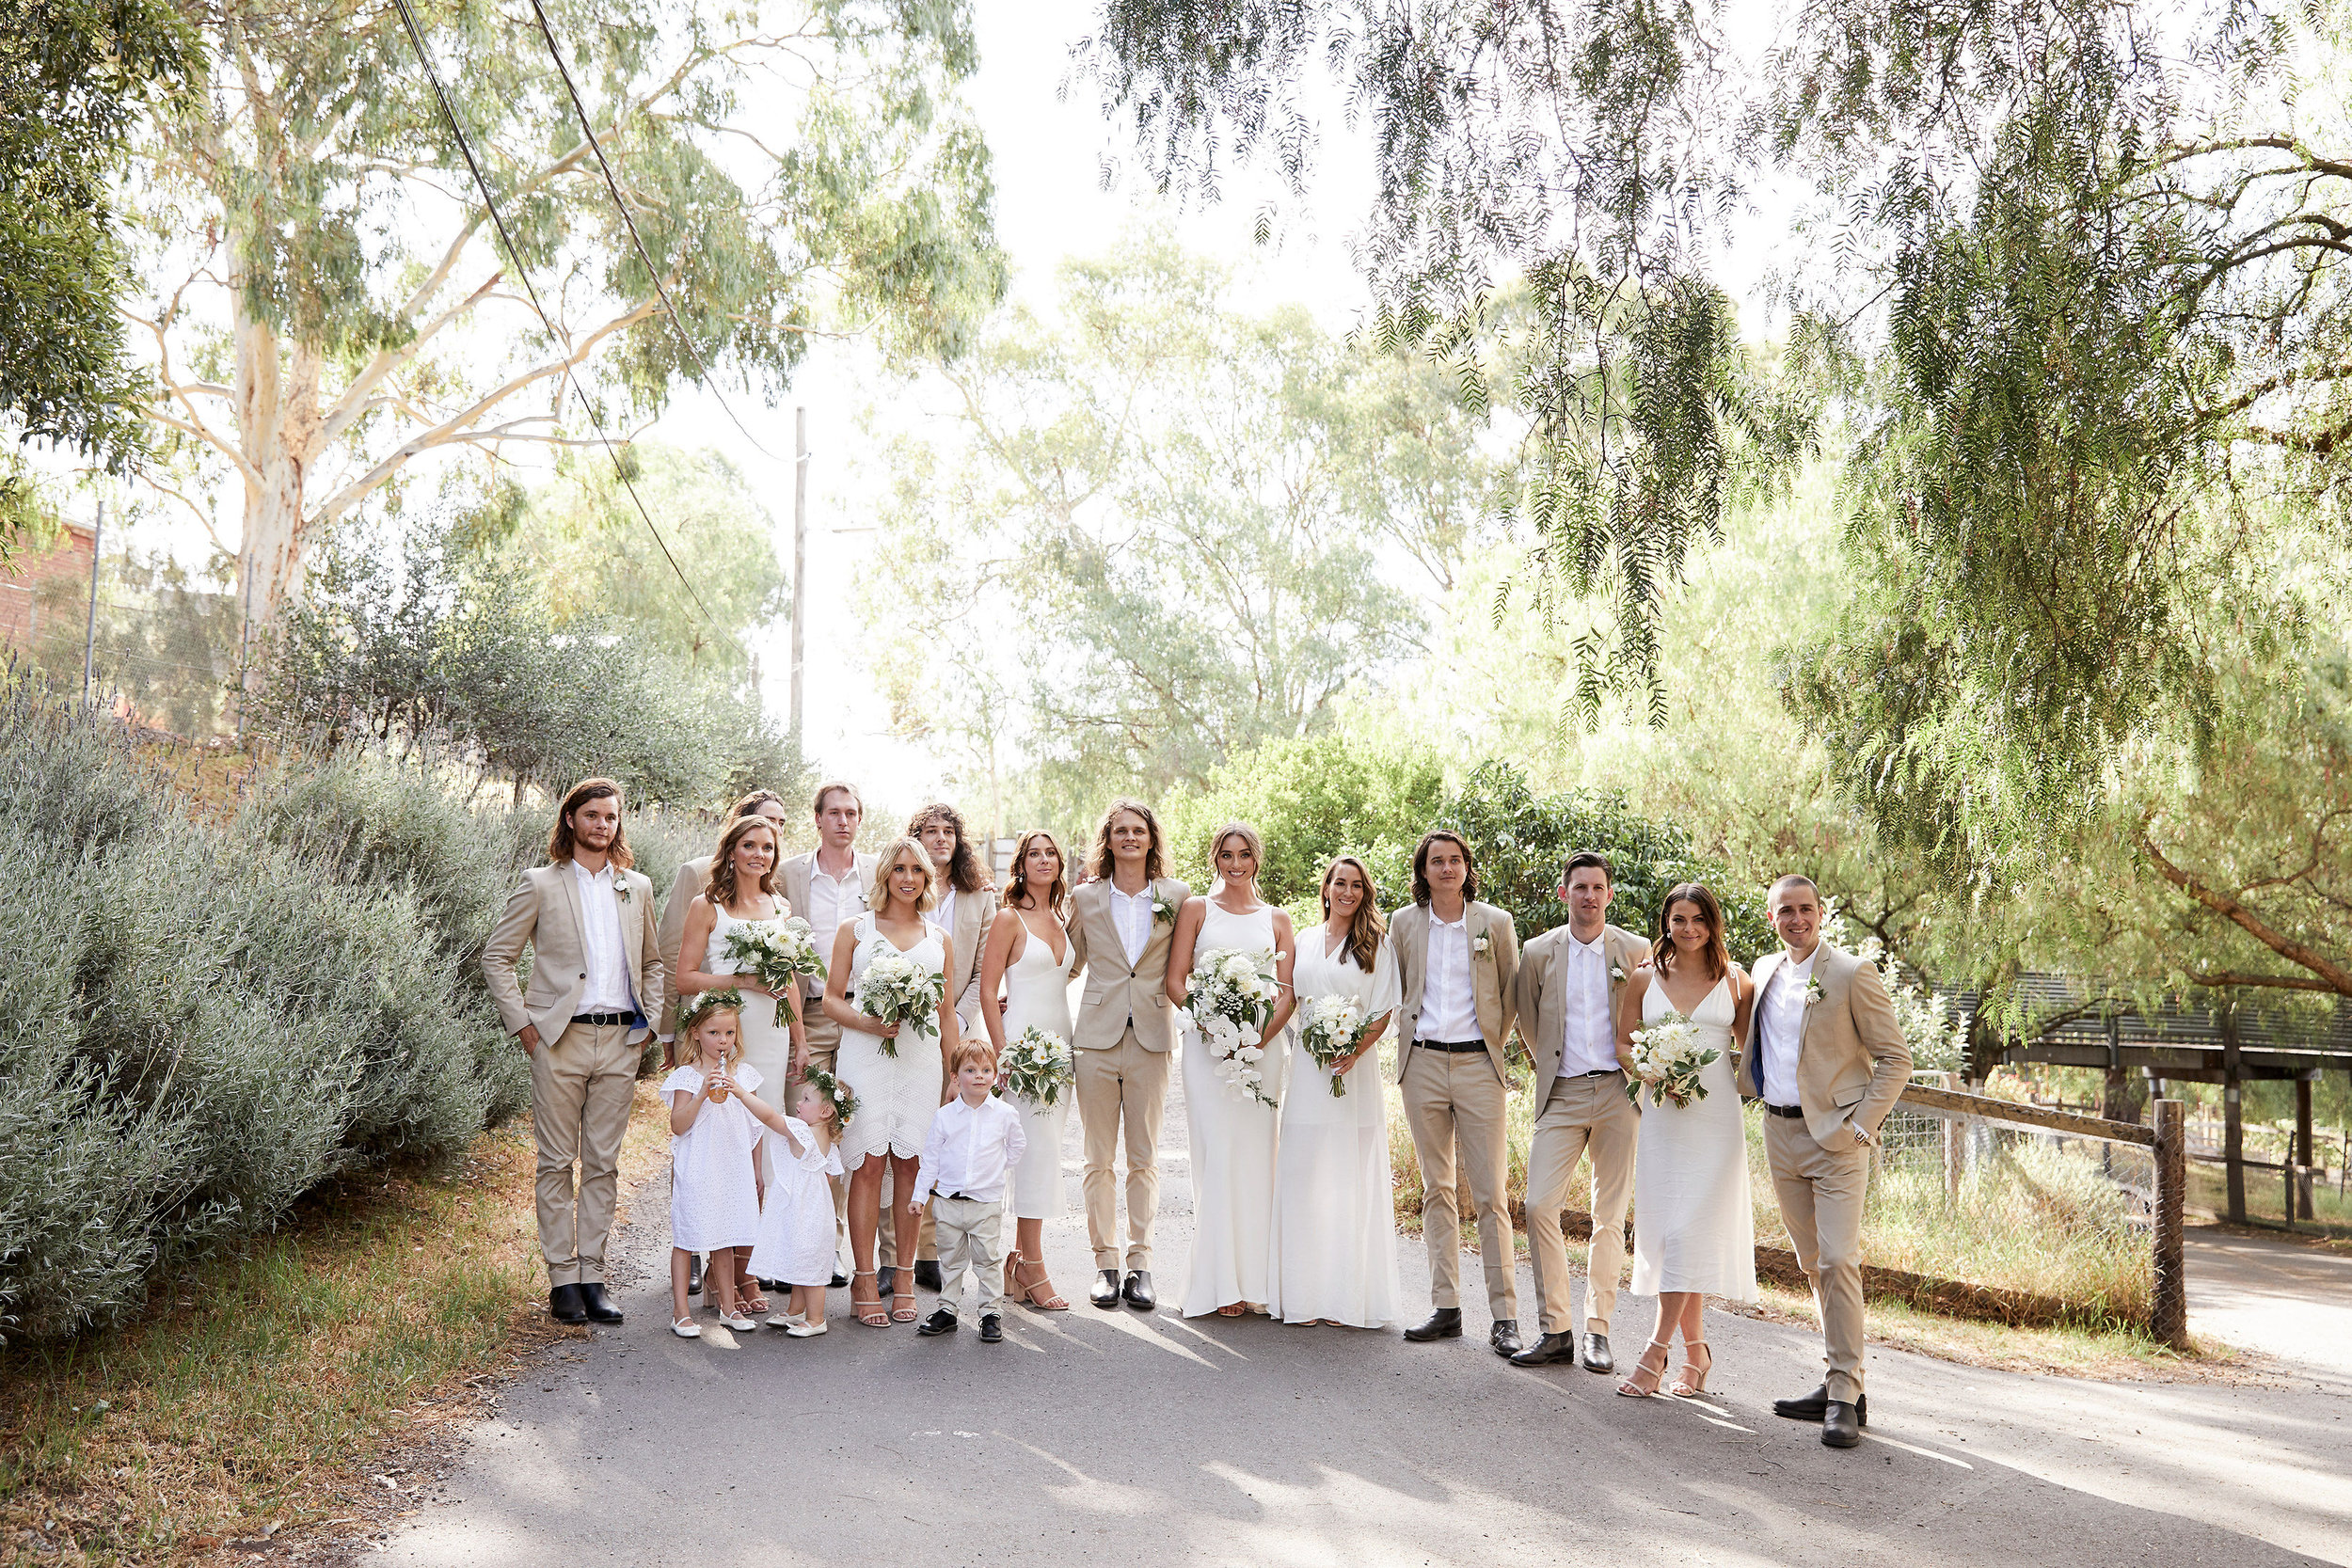 Philippa & Stu's Wedding featured on LOVE FIND CO. Bridal Directory